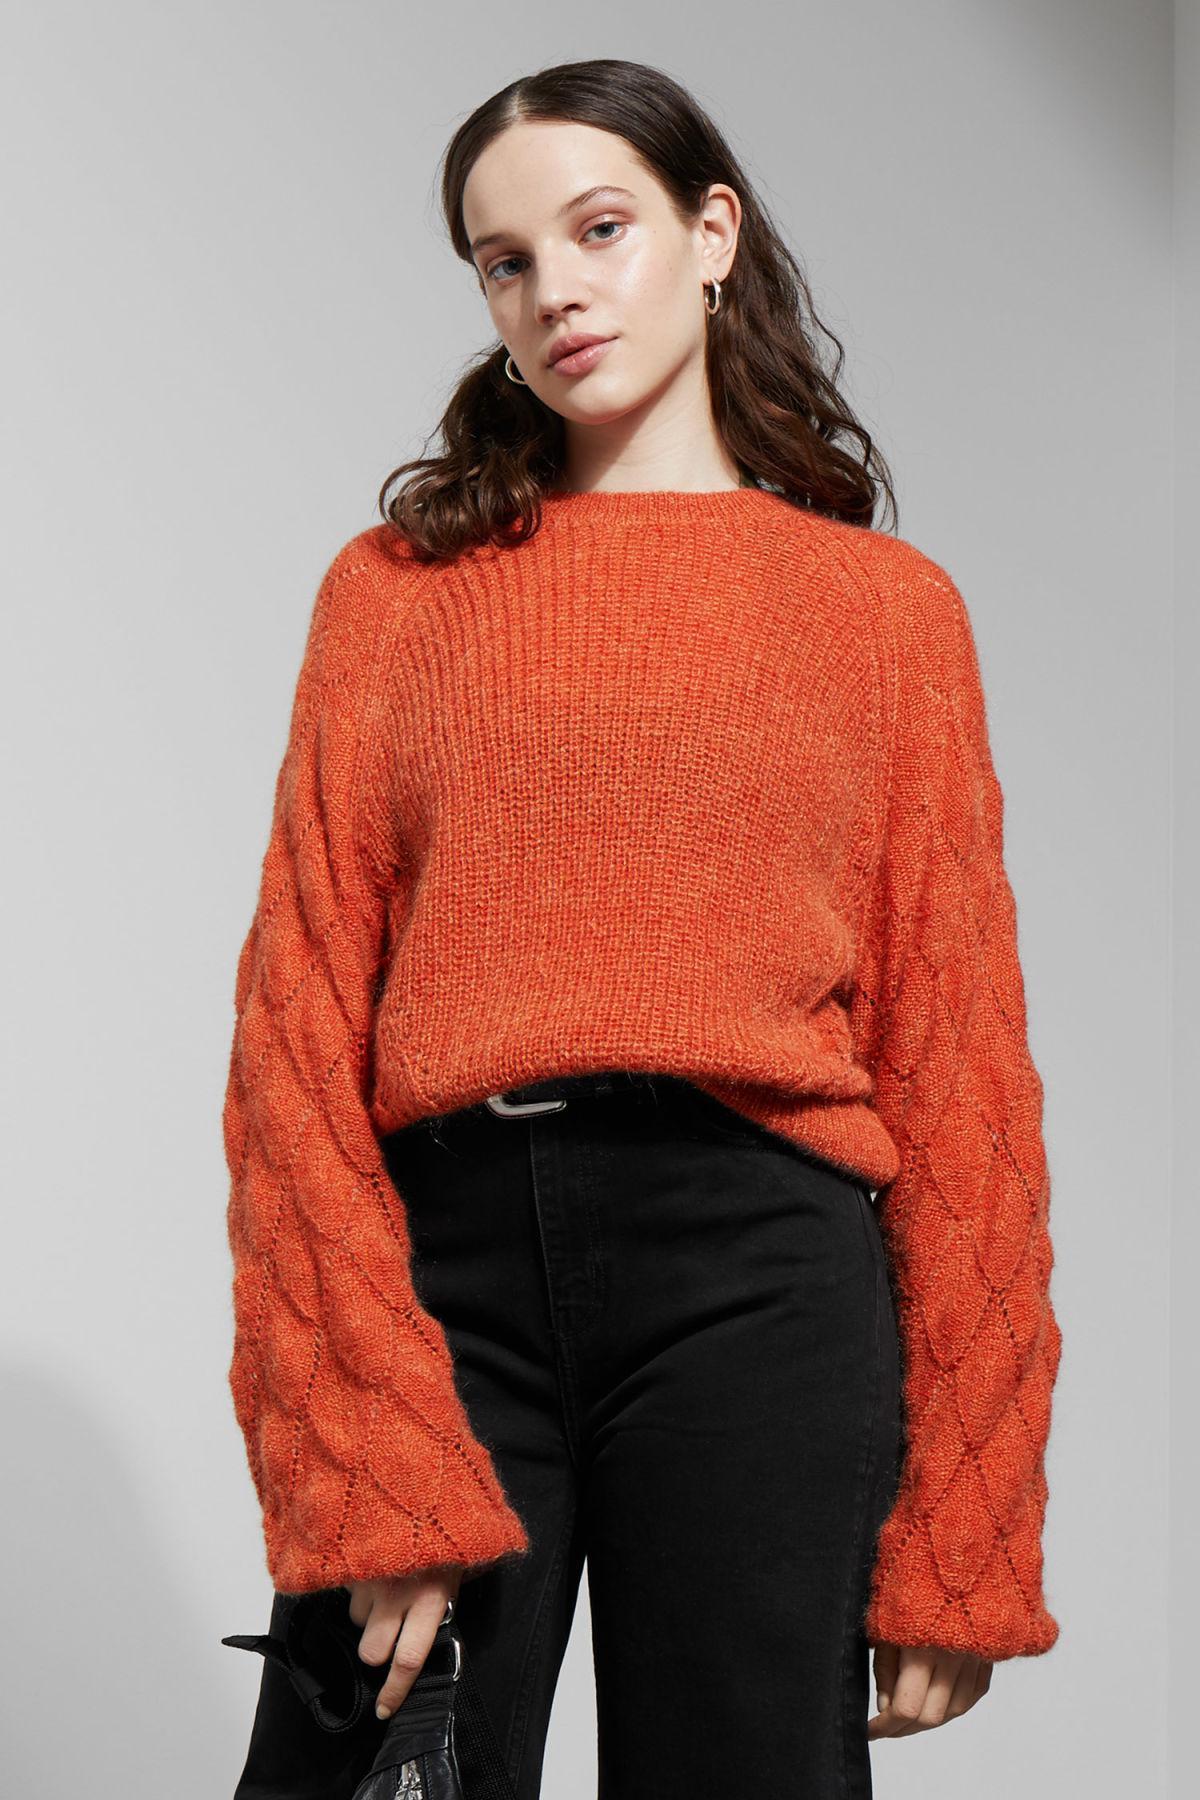 Lyst Orange Sweater Weekday Soul In qwXfHag